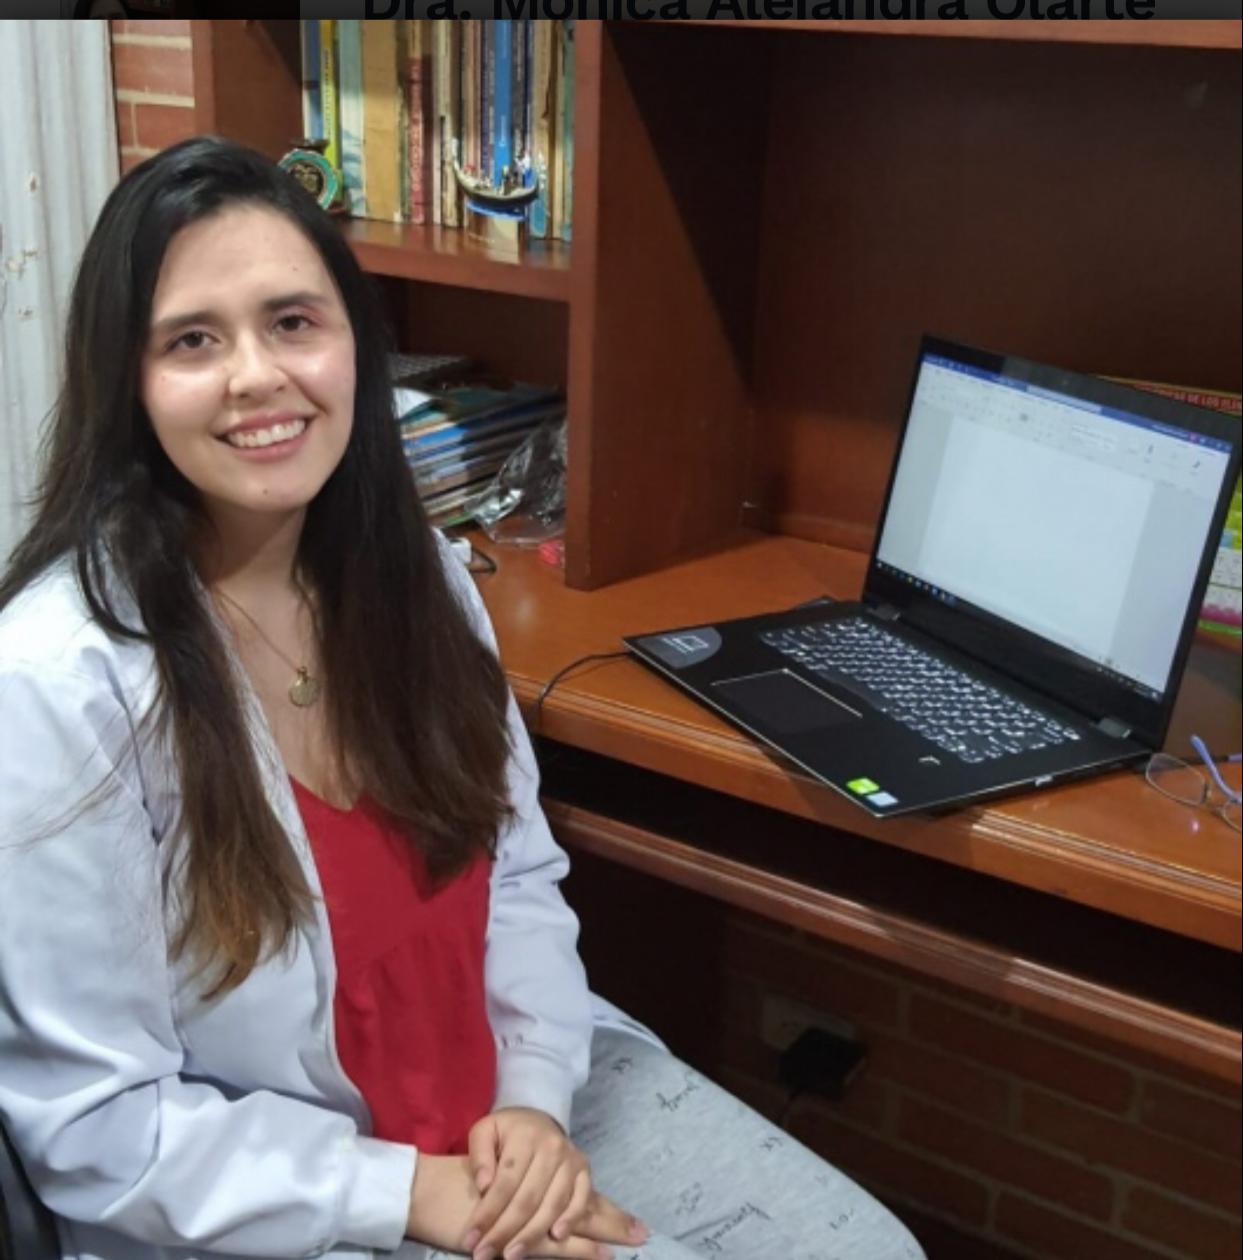 Dra. Monica Alejandra Olarte Bernal